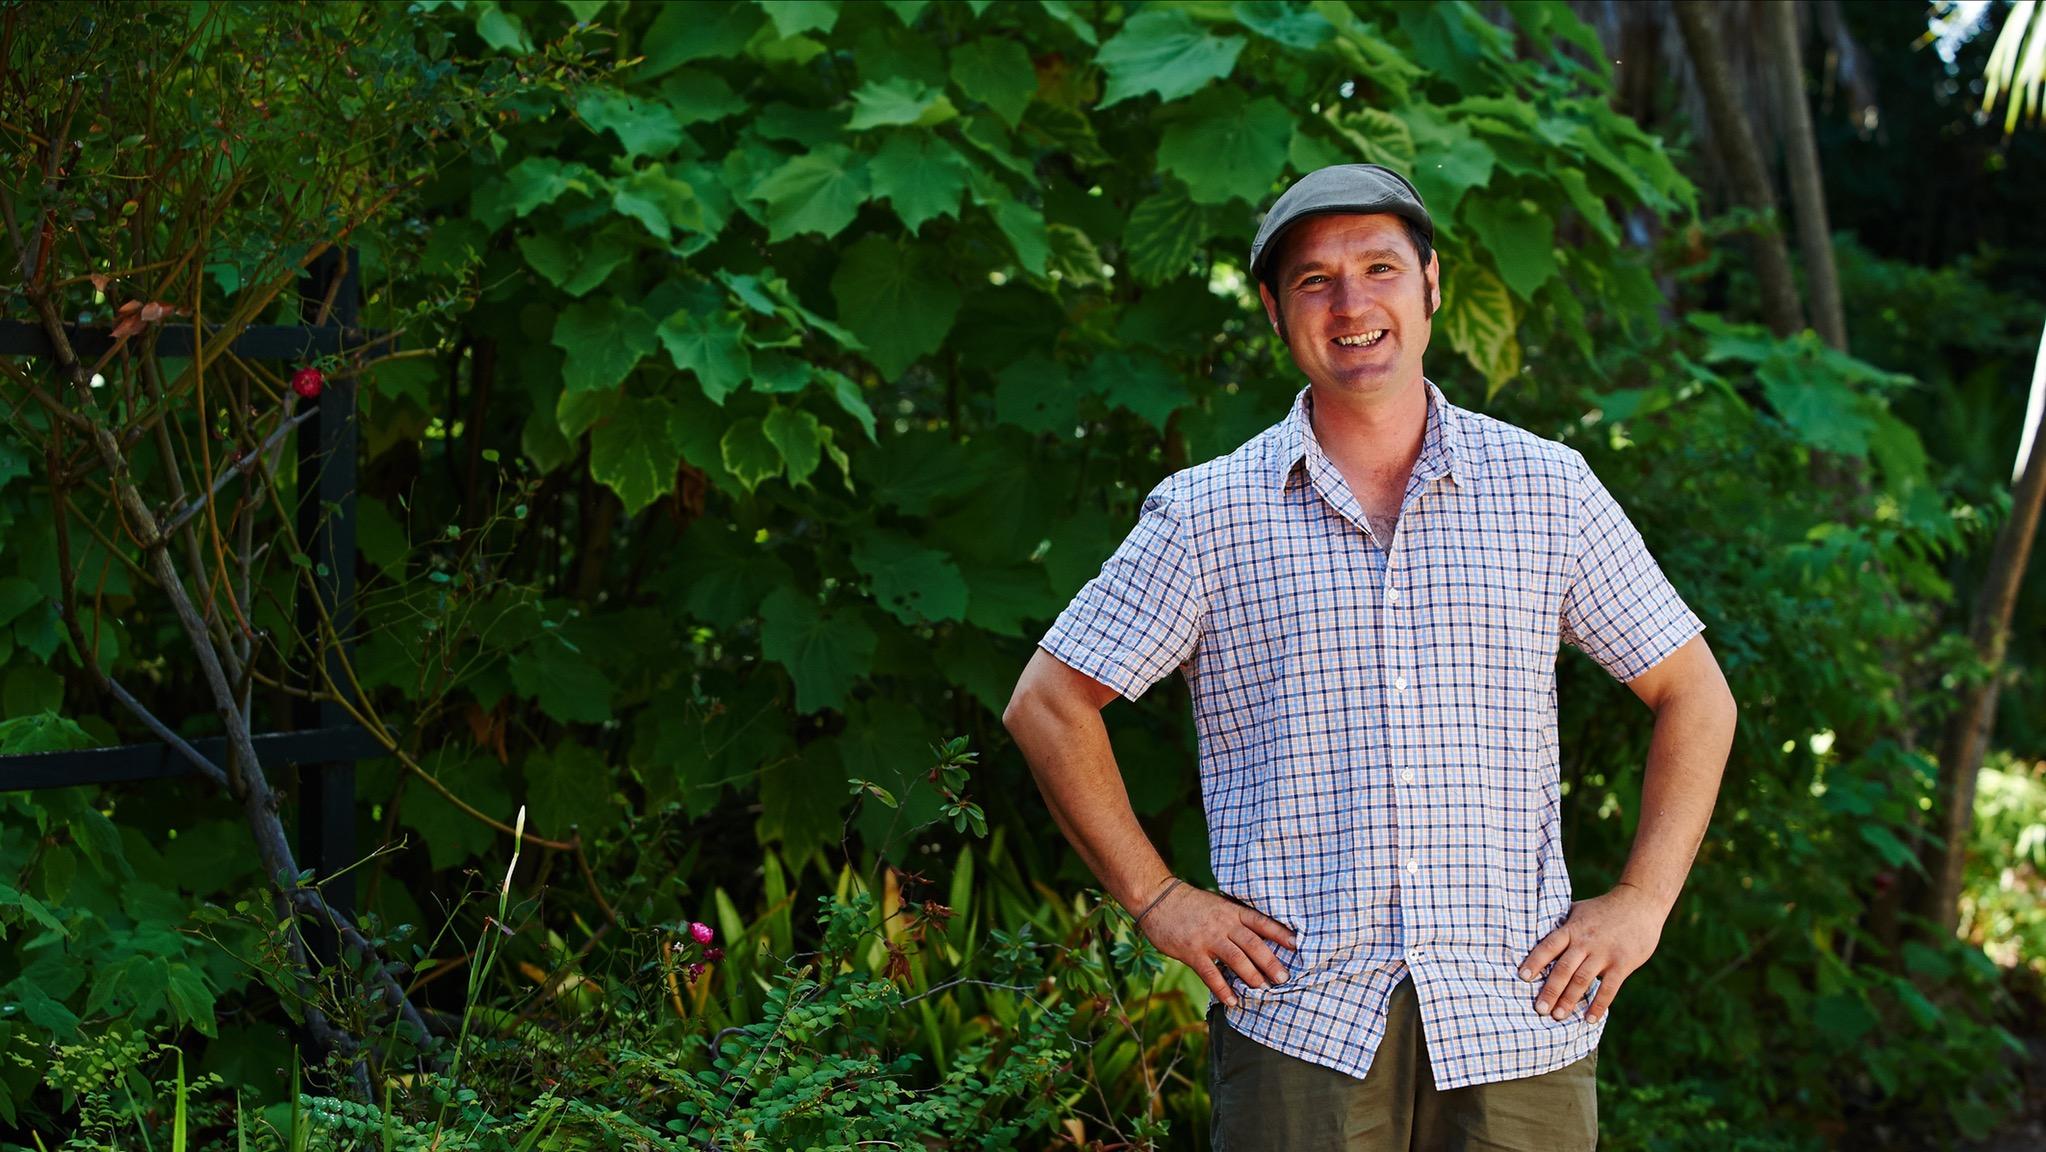 Tino Carnevale gardening expert